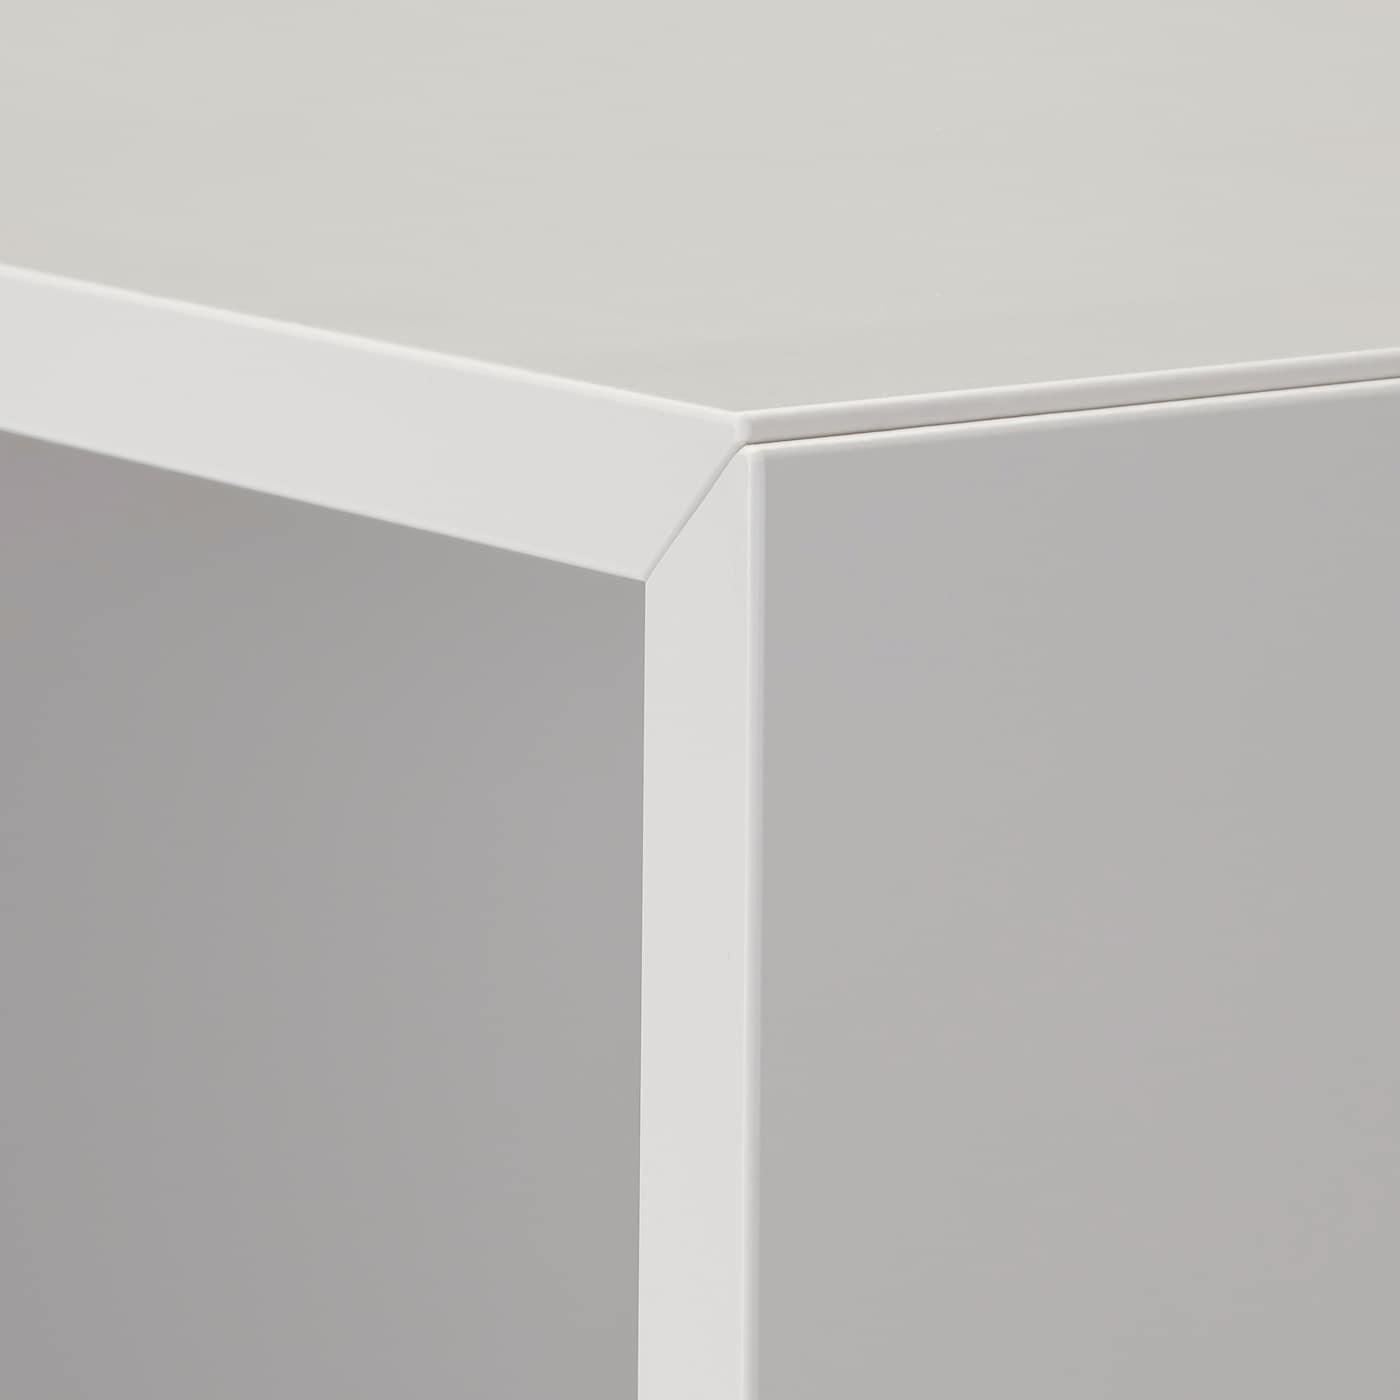 "EKET Wall-mounted cabinet combination, white/dark gray/light gray, 68 7/8x9 7/8x27 1/2 """